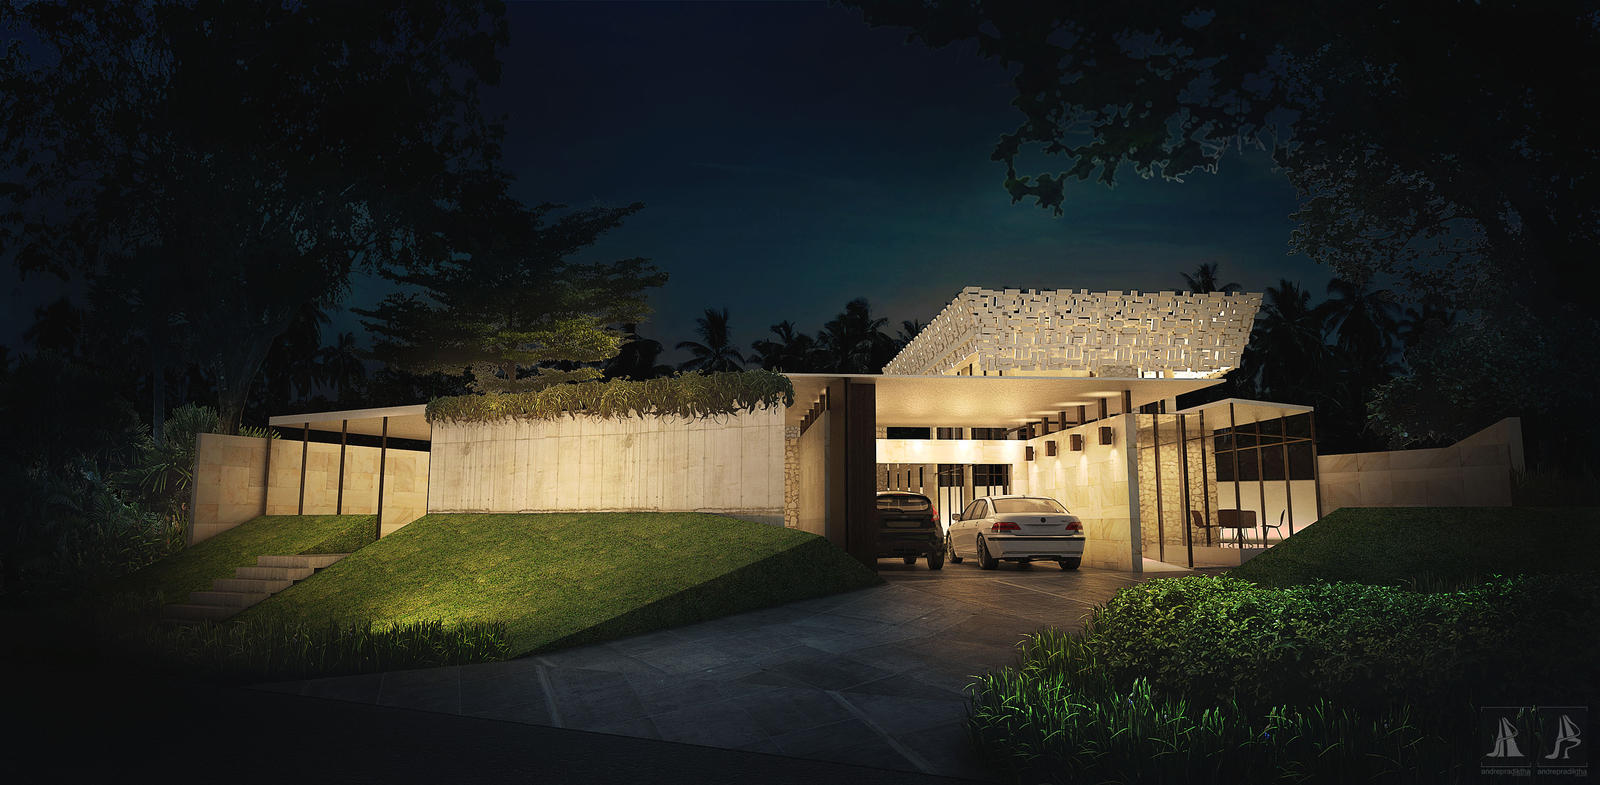 la maison de verre nighttime by air scene on deviantart. Black Bedroom Furniture Sets. Home Design Ideas